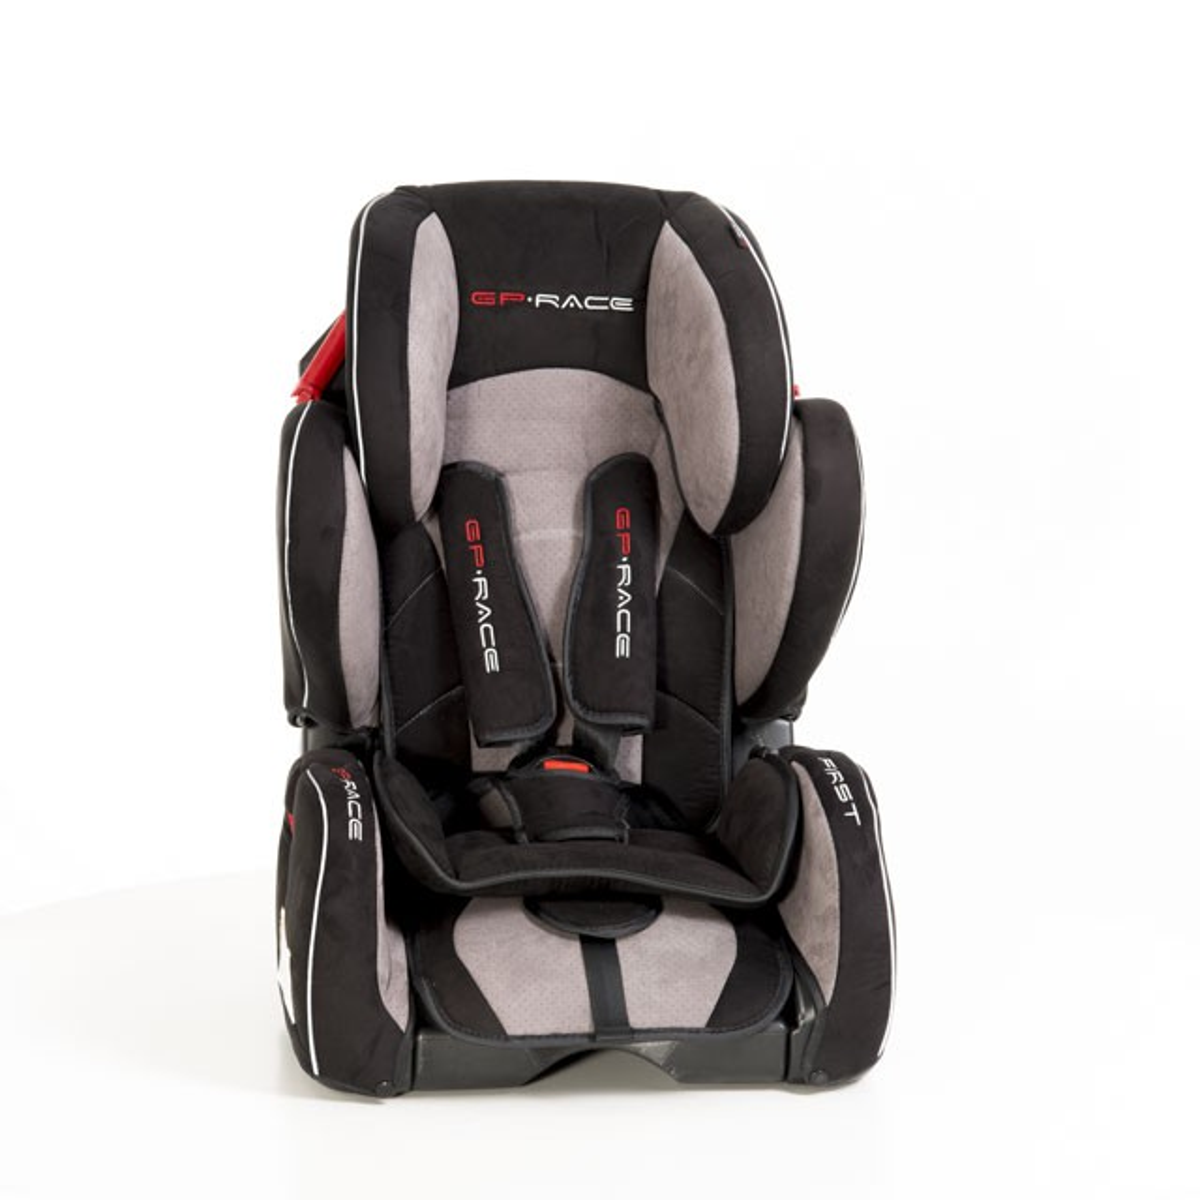 baby seat first group i ii iii gp race equipment. Black Bedroom Furniture Sets. Home Design Ideas